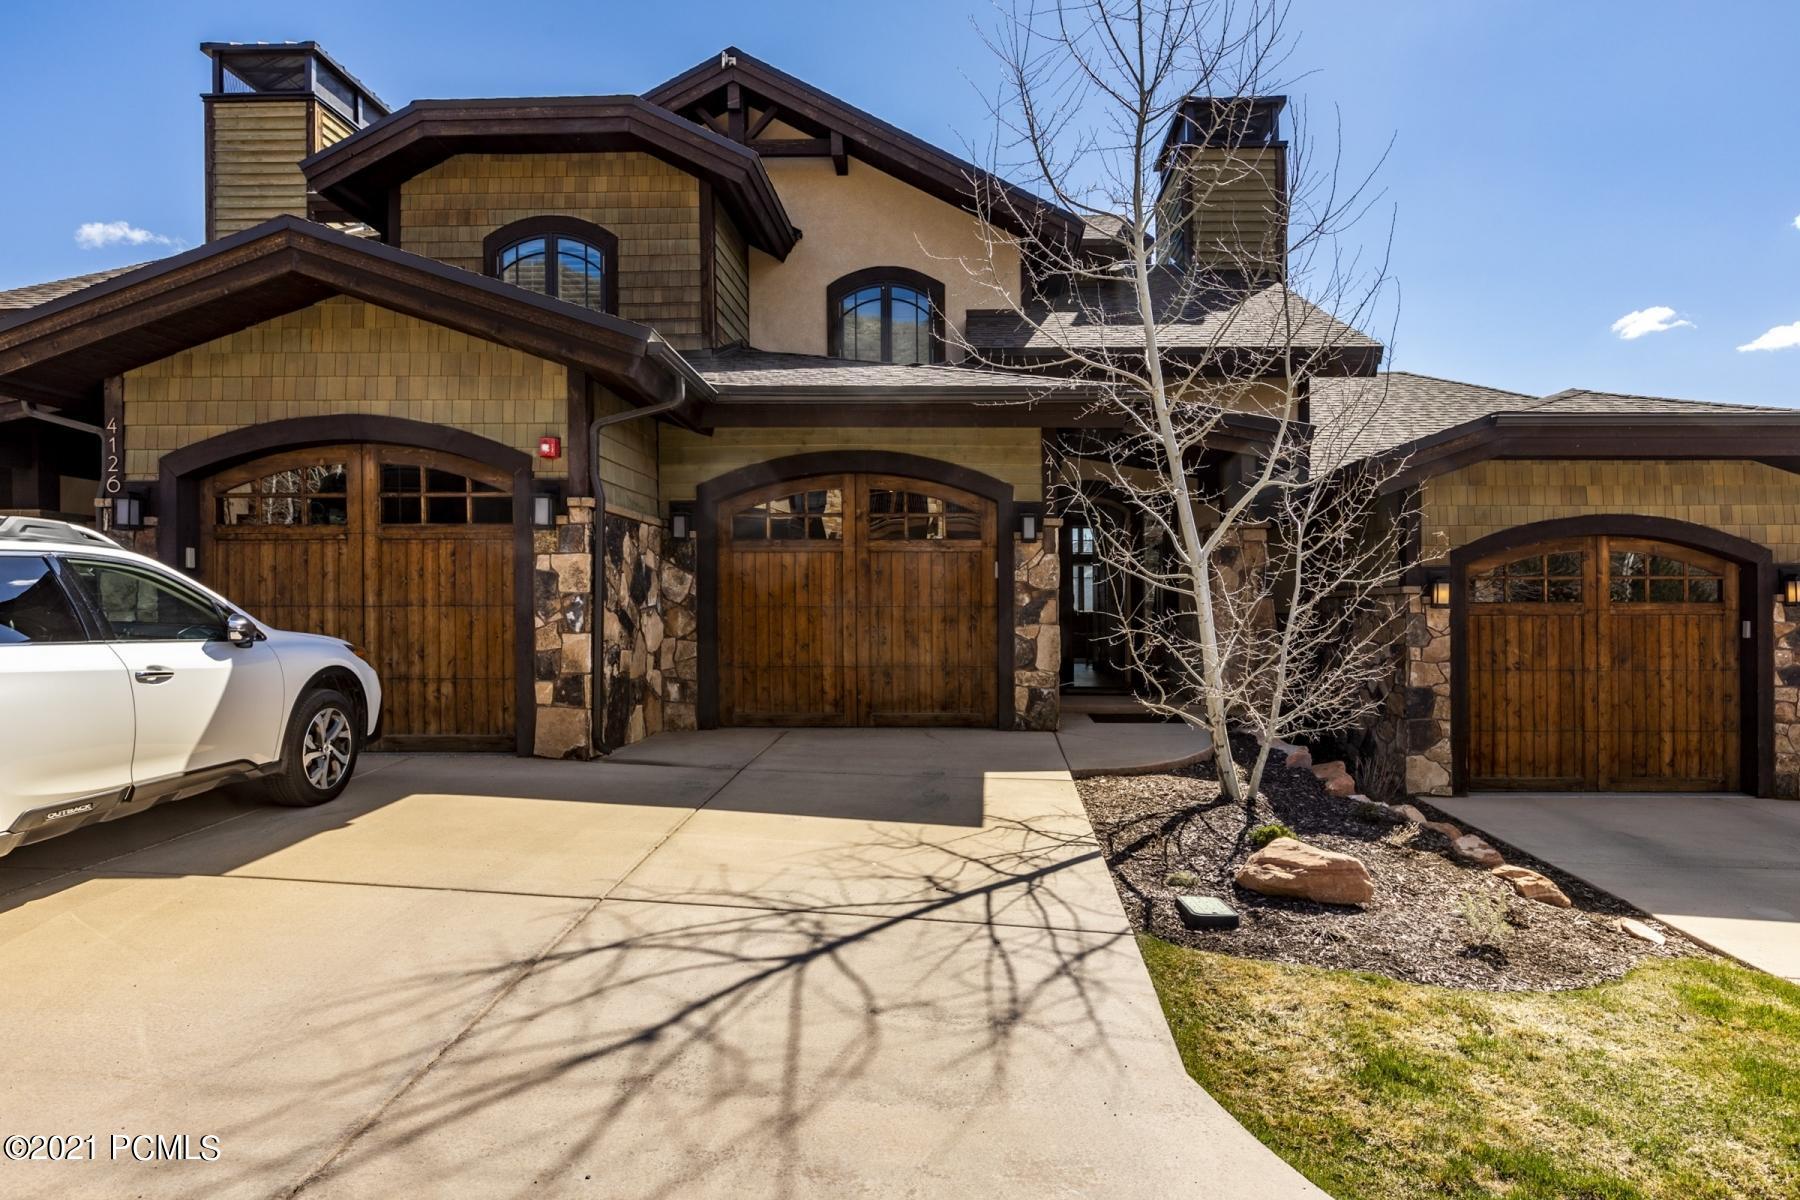 4122 Fairway Lane, Park City, Utah 84098, 3 Bedrooms Bedrooms, ,3 BathroomsBathrooms,Condominium,For Sale,Fairway Lane,12101401